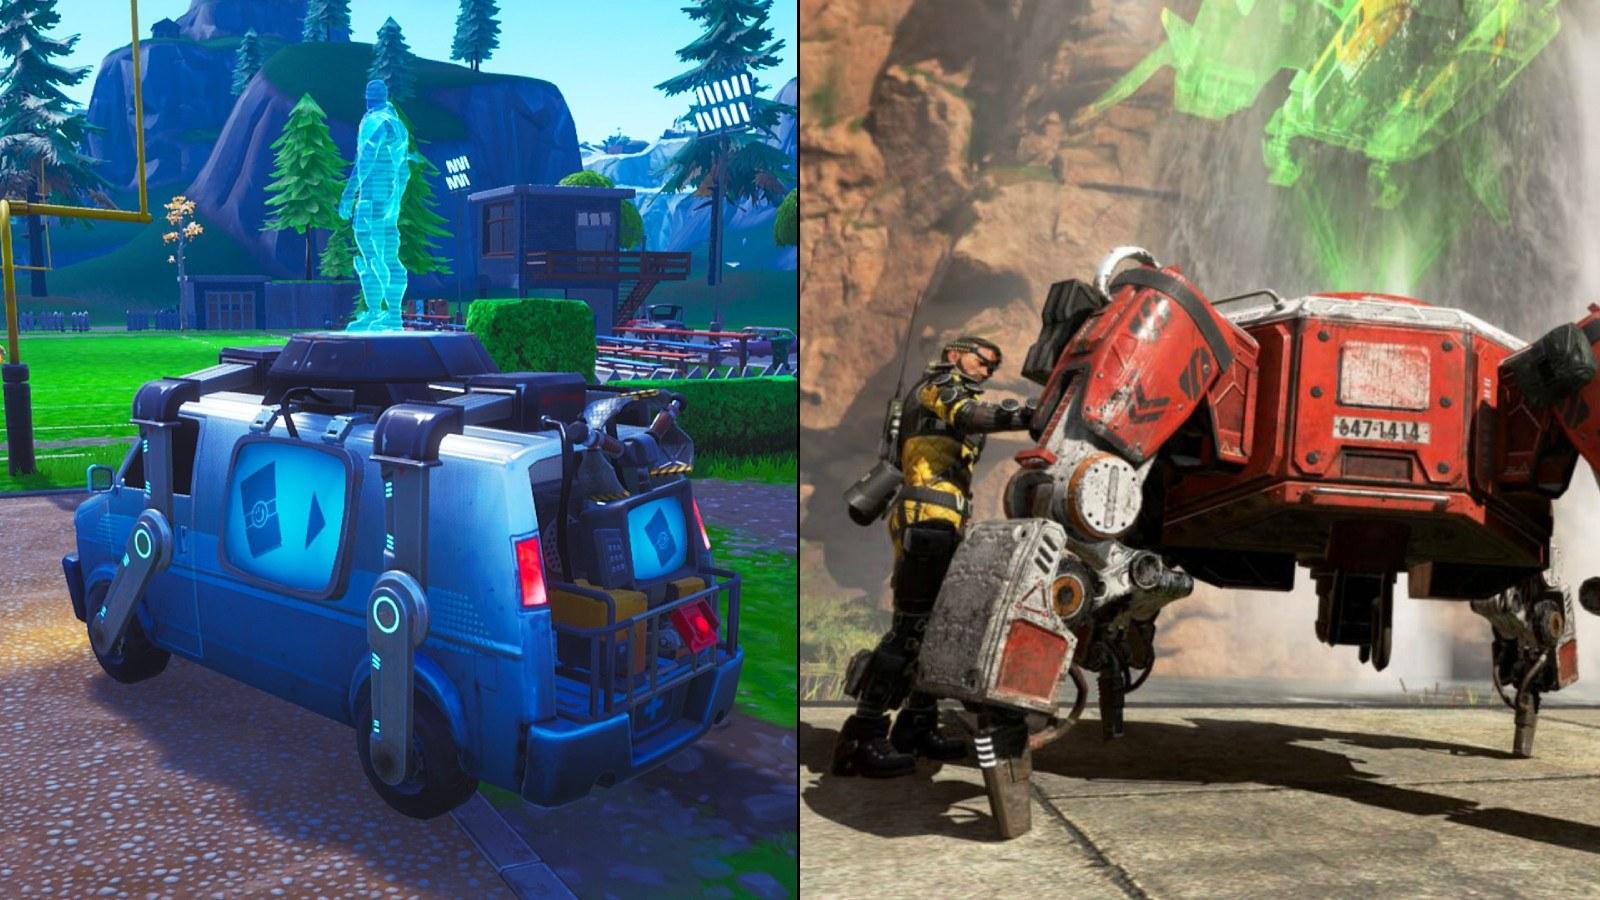 Epic Games/Respawn Entertainment